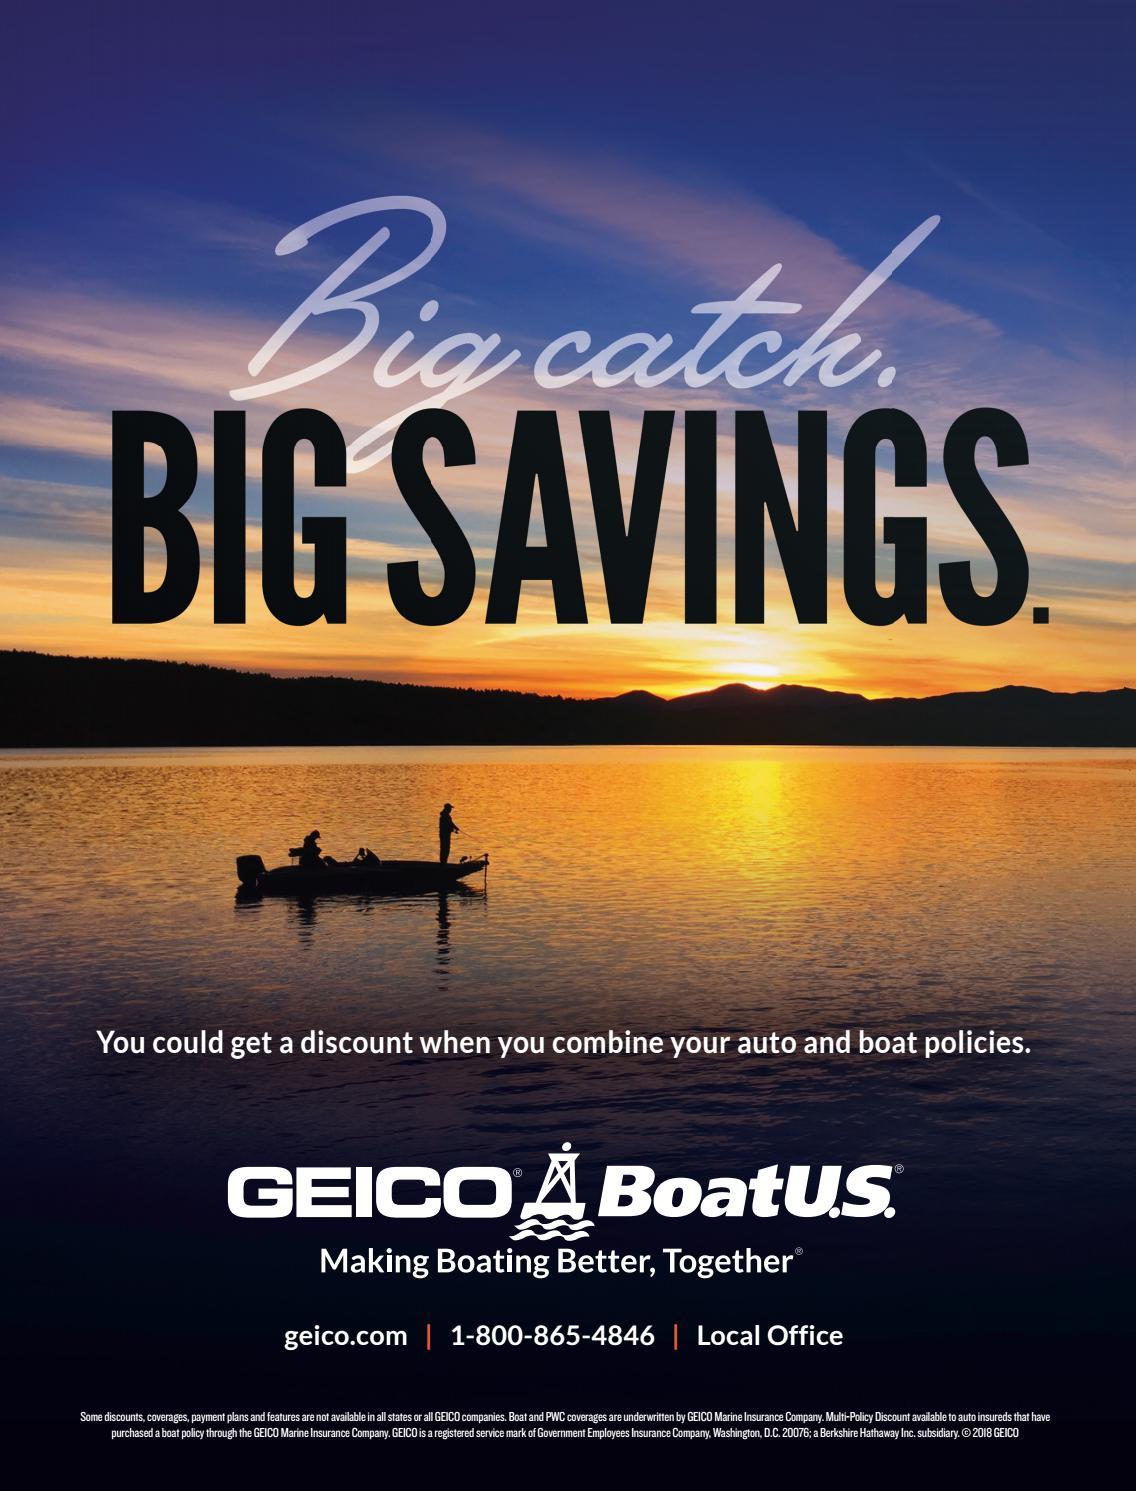 Geico Marine Insurance >> Tn Fishing Guide 2018 2019 By Bingham Group Issuu